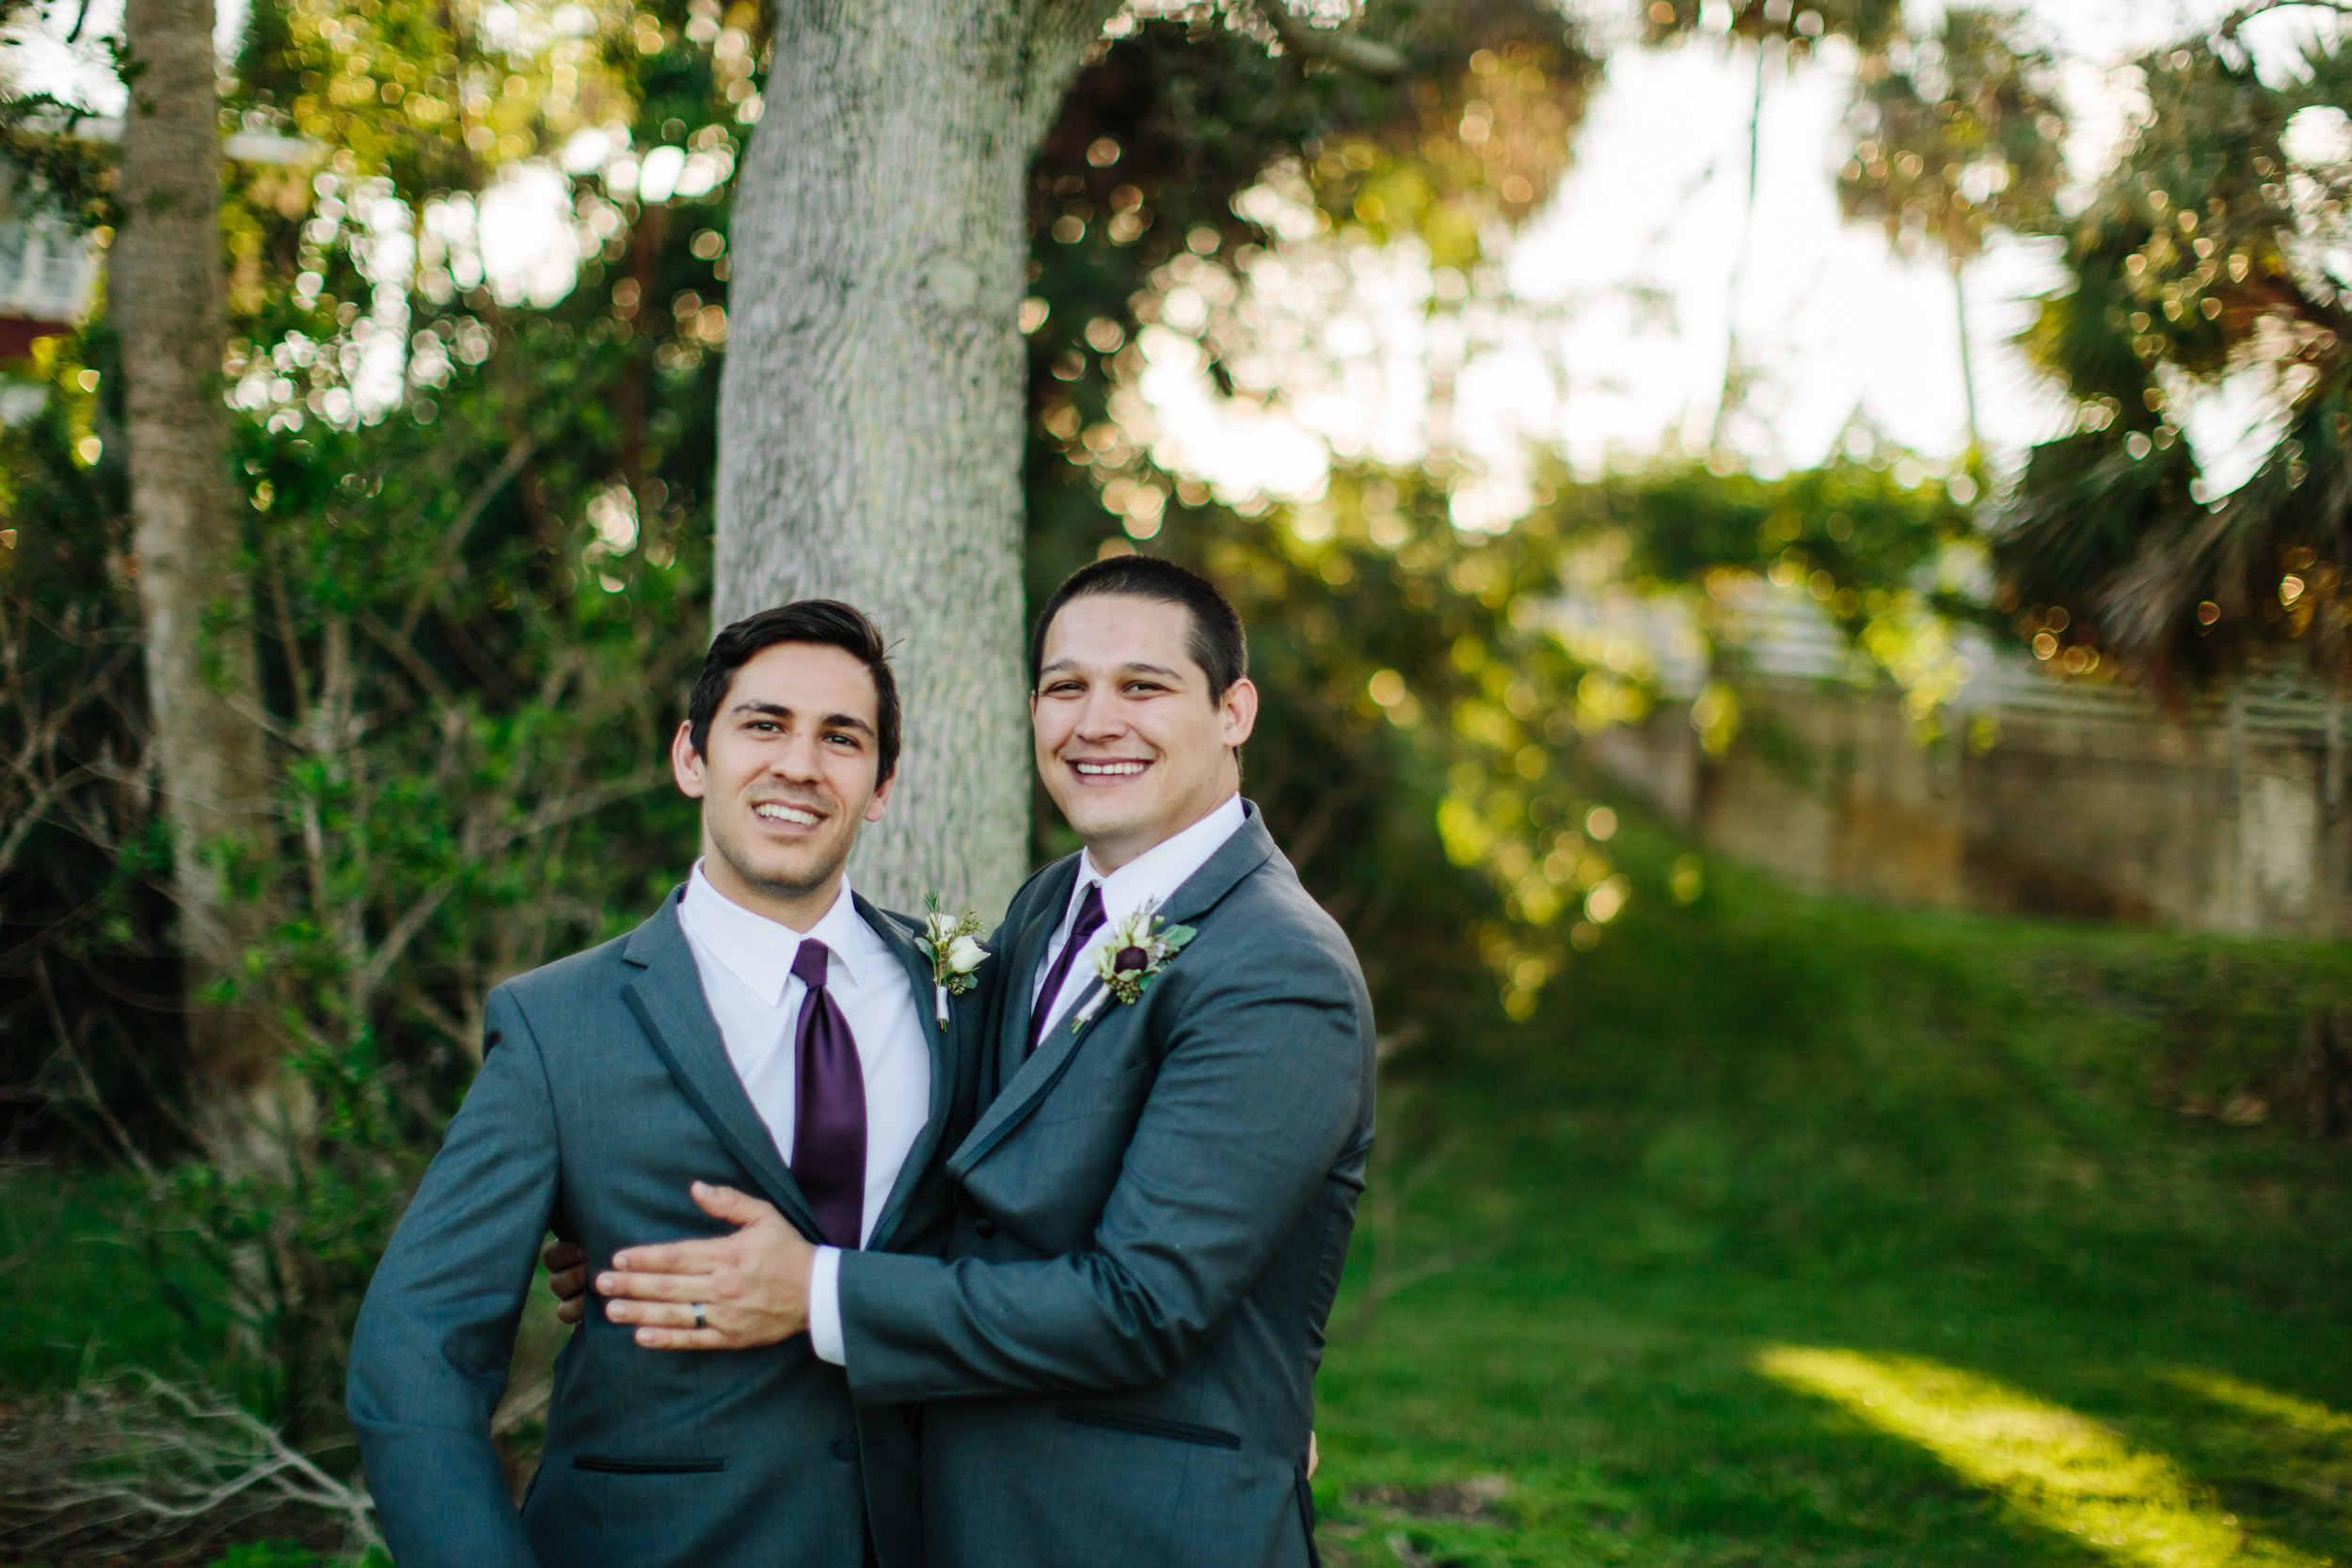 2018.02.17 Whitney and Joe Meyer Melbourne Wedding (421 of 759).jpg